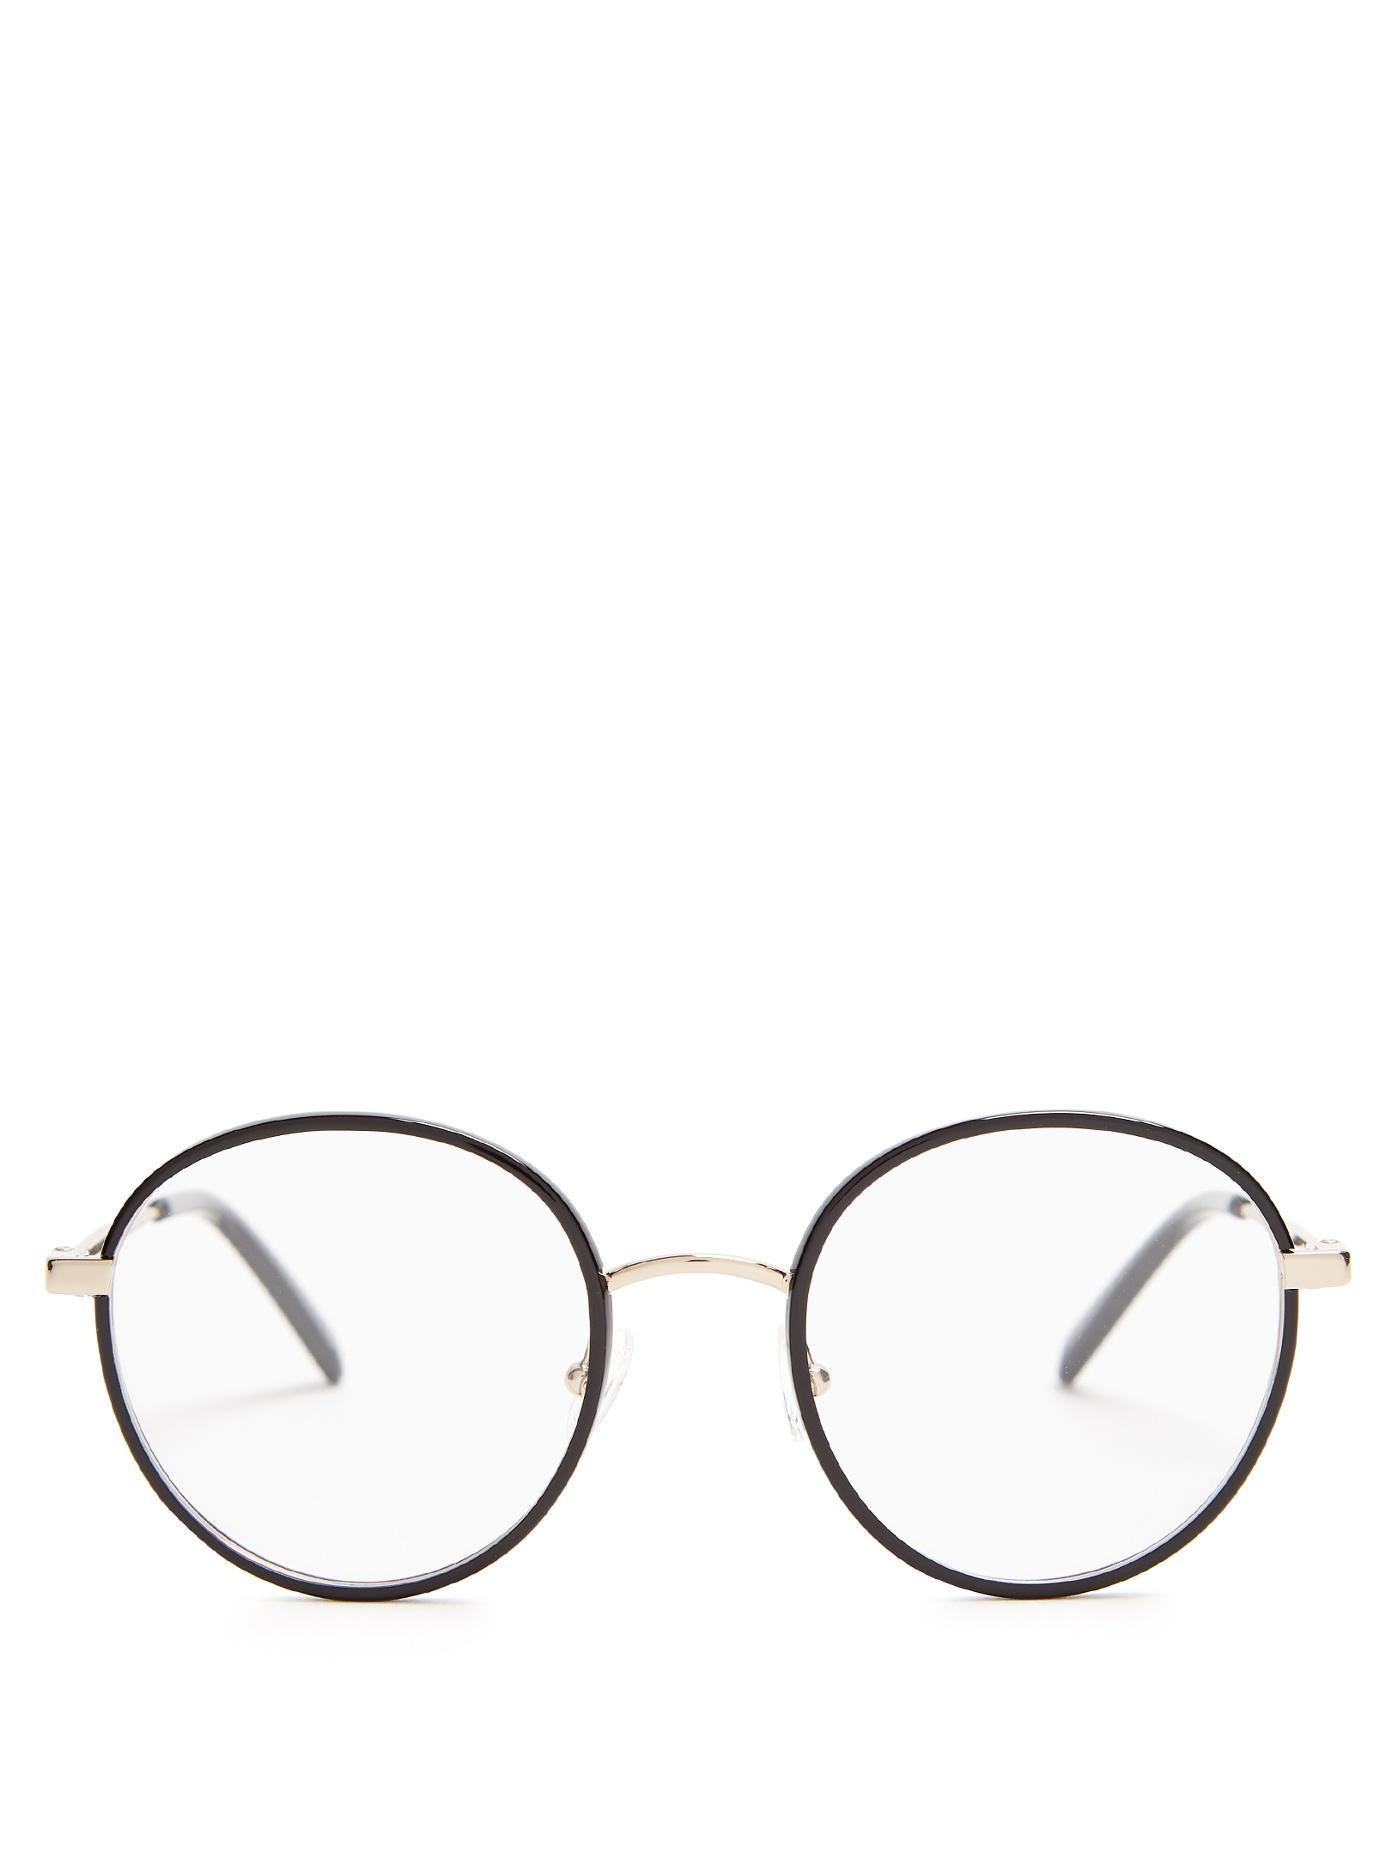 7ee7bb7ae2d6c Stella Mccartney Round-Frame Metal Glasses In Black